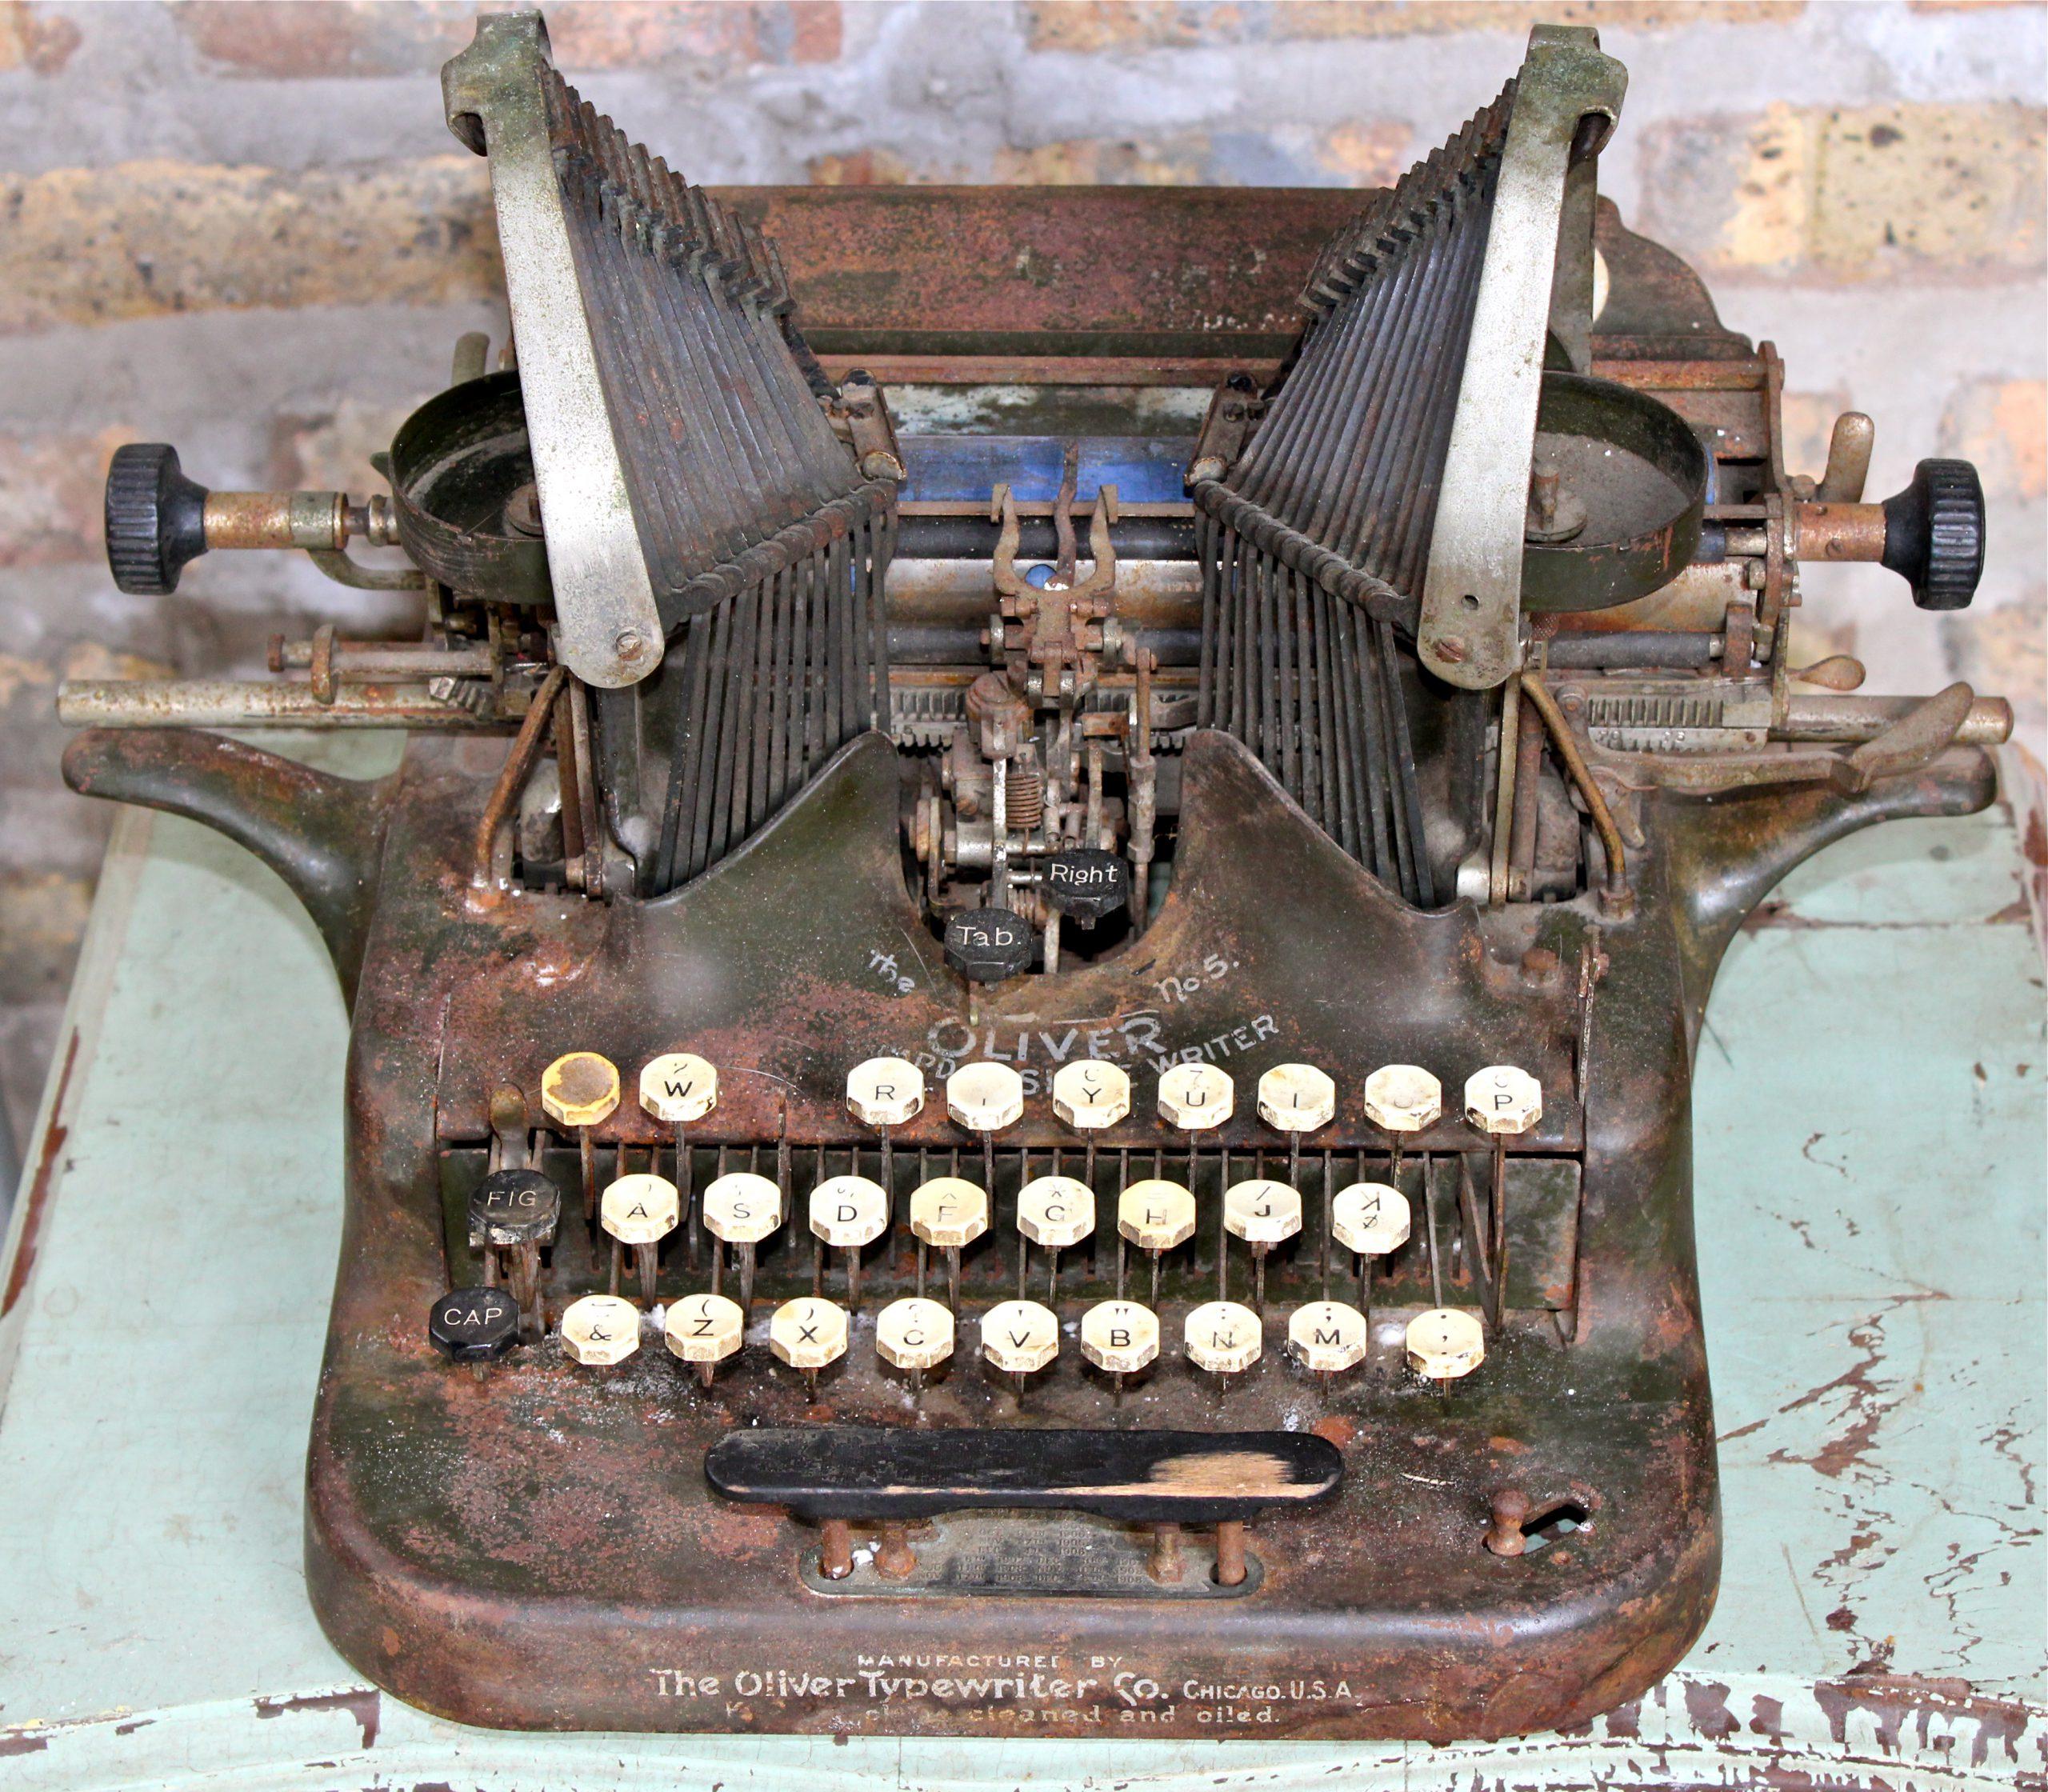 Oliver Typewriter No. 5